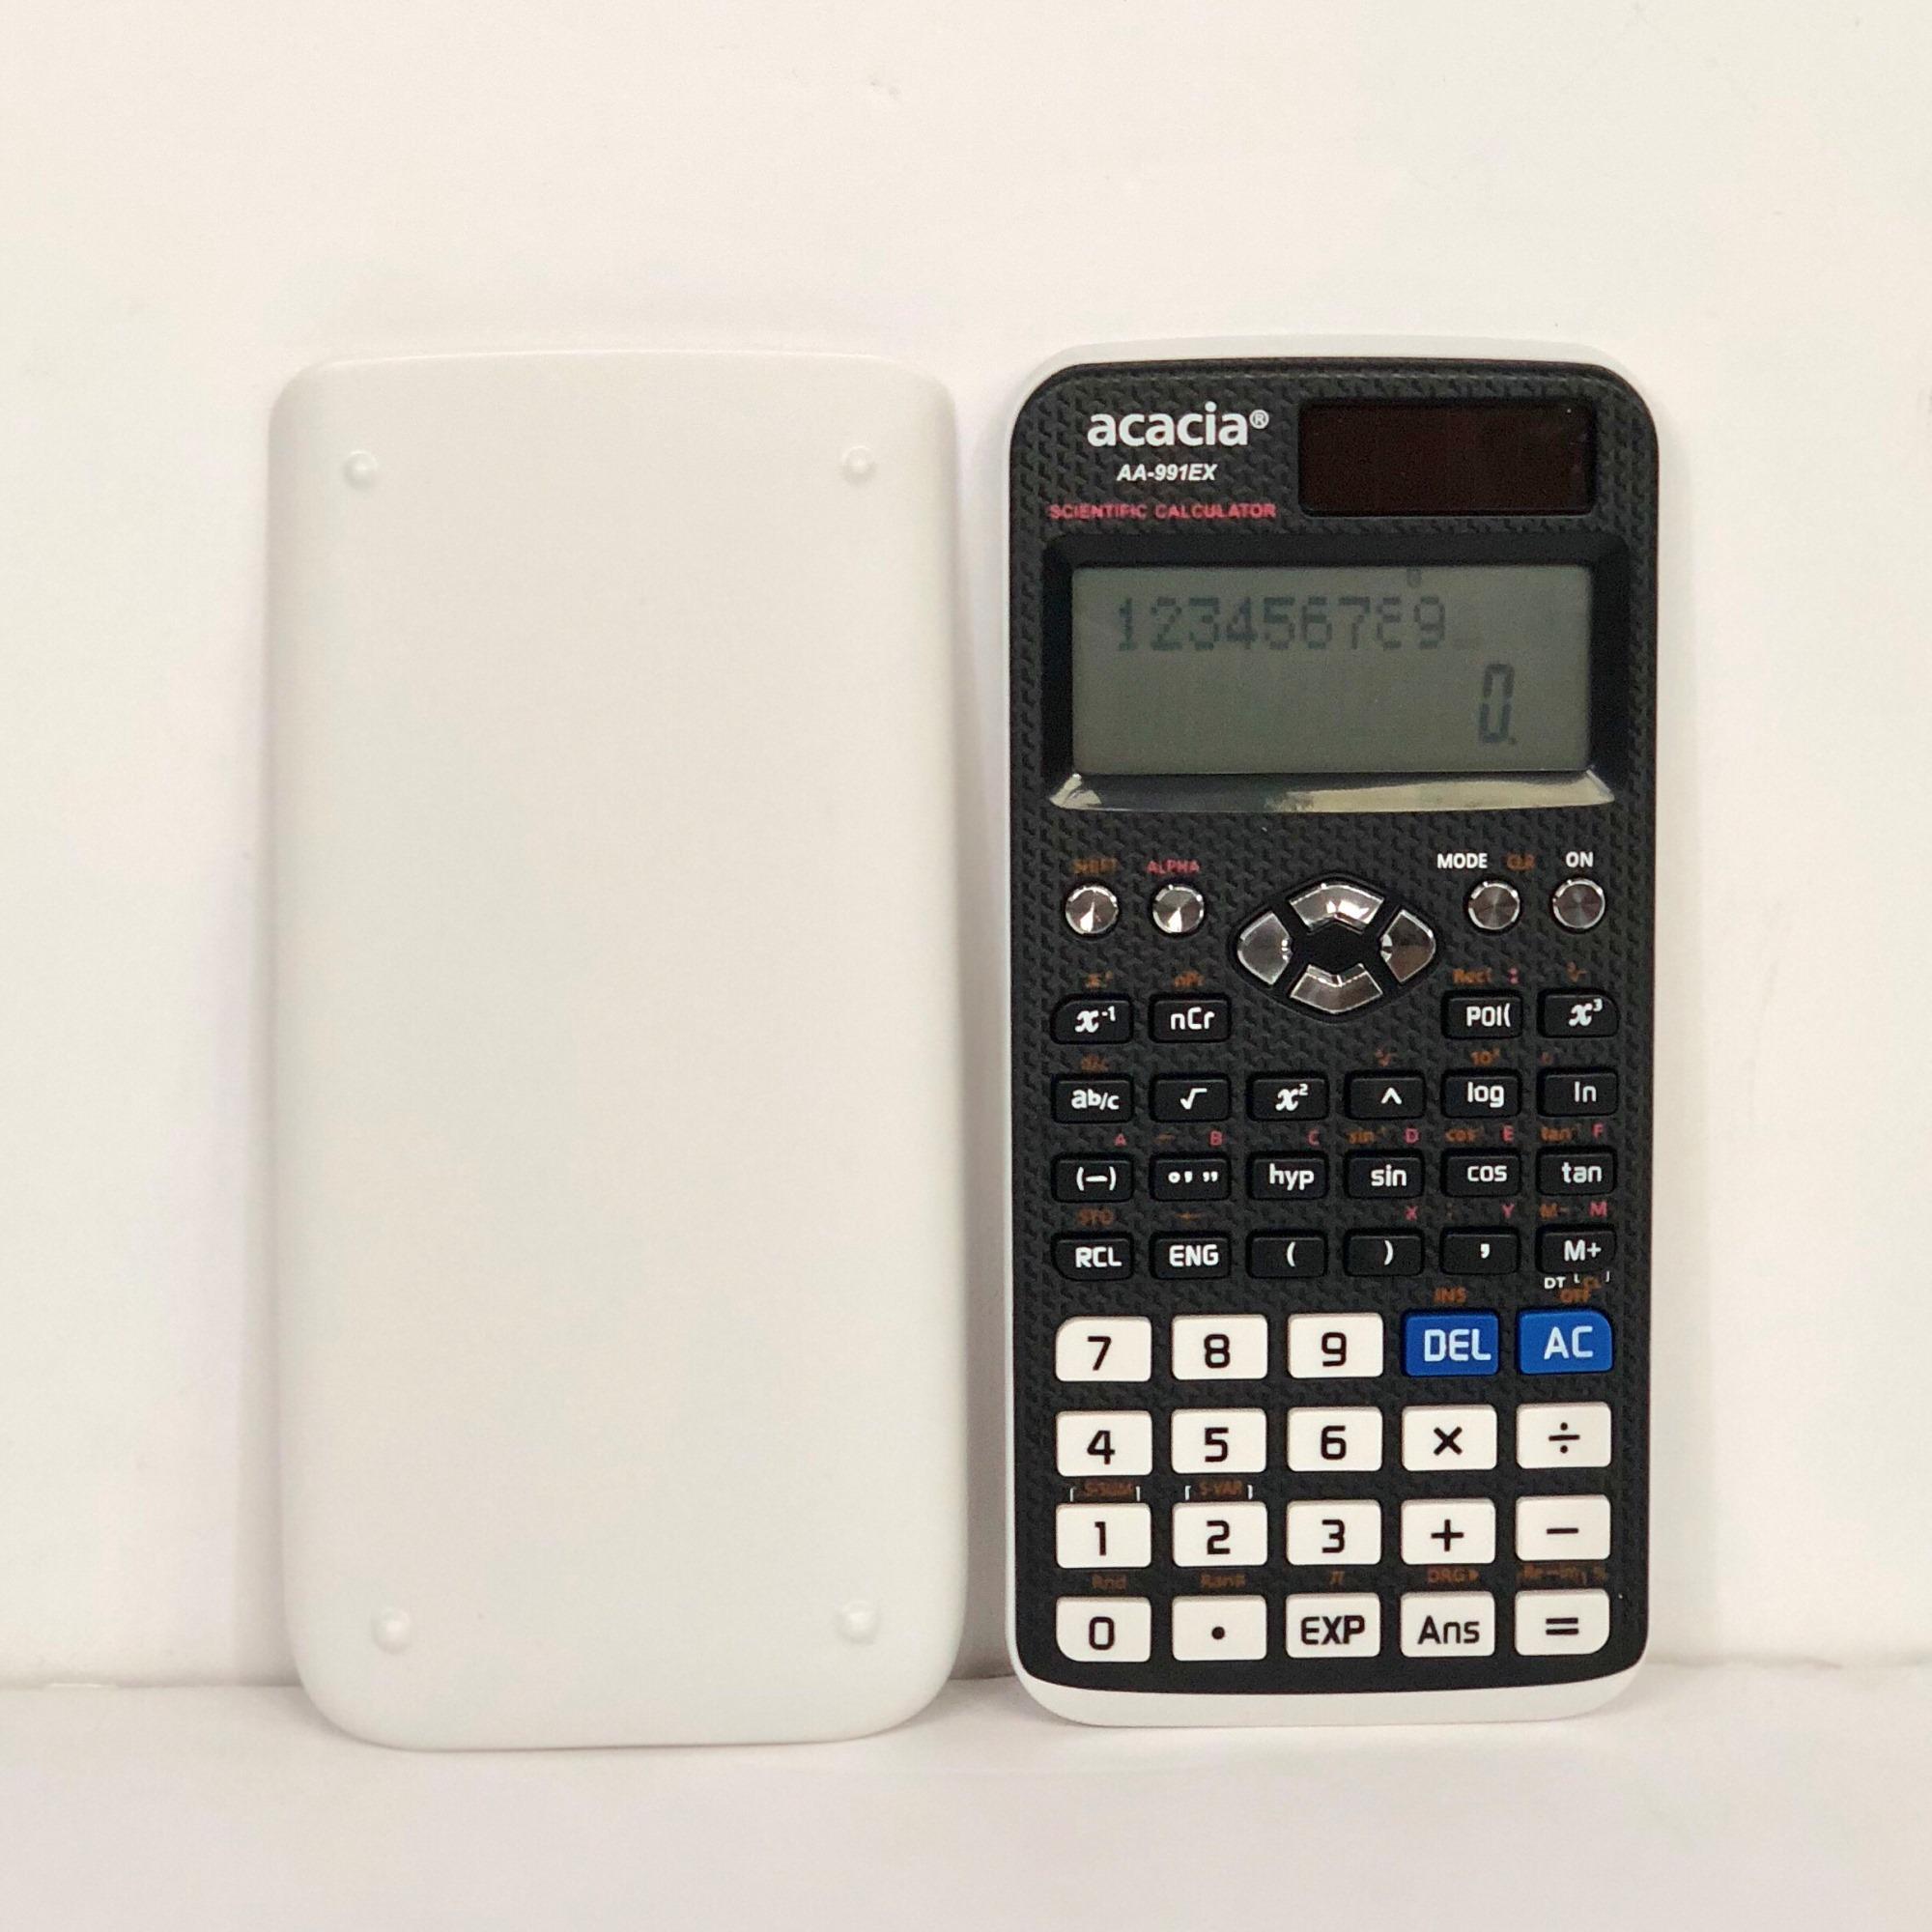 Calculator For Sale Calculators Prices Brands Review In Kalkulator Casio Portable Printer Hr 8 Tm Two Way Power Display Scientific Aa 991ex